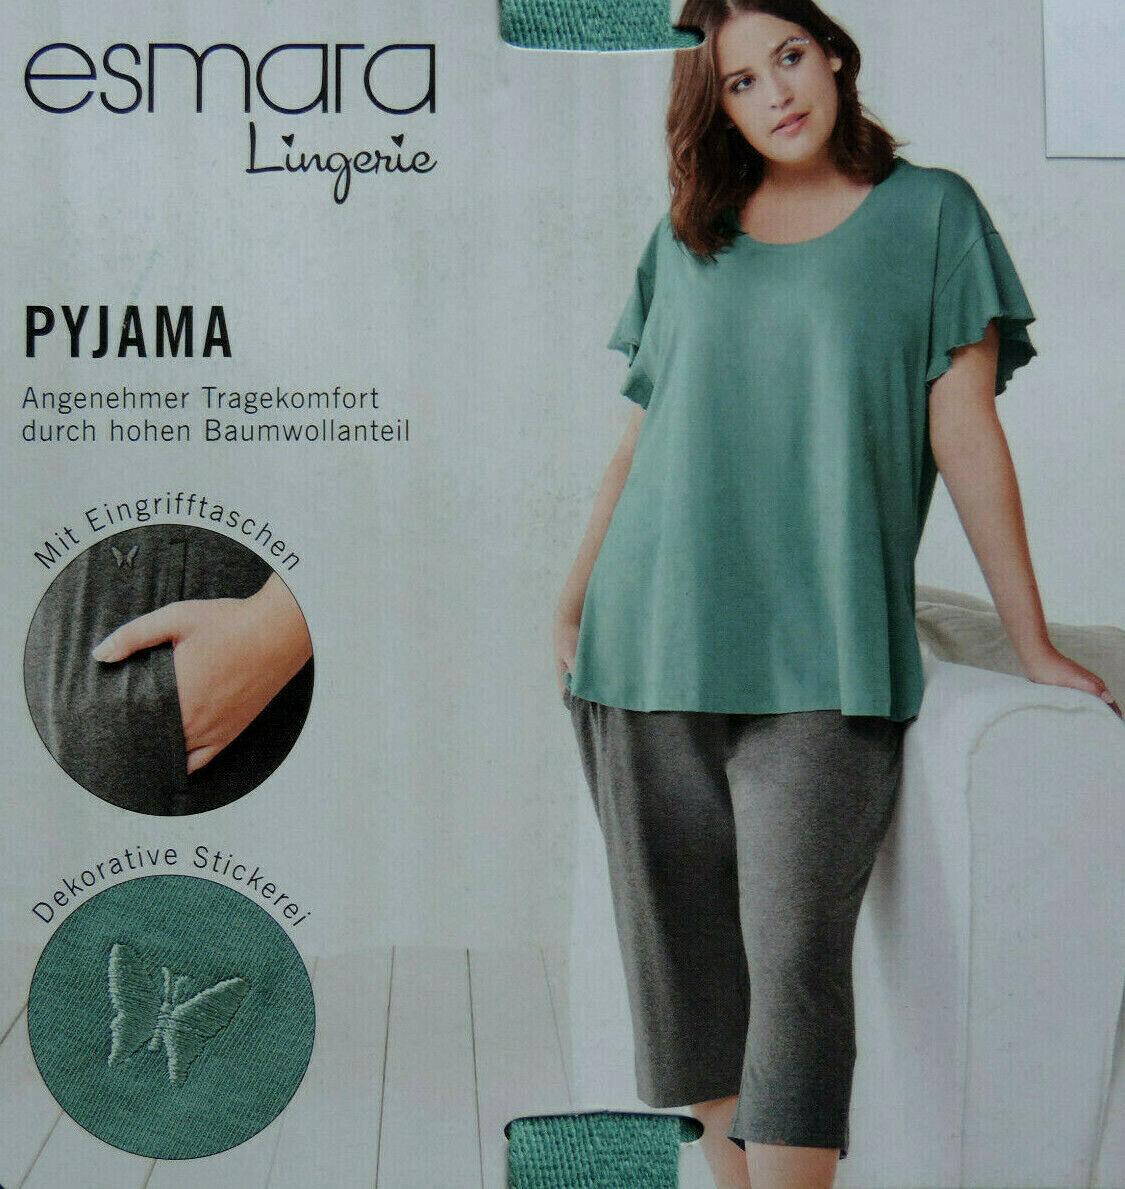 Damen Pyjama Schlafanzug XL XXL 3XL 58 Übergröße Sommerschlafanzug Hausanzug NEU